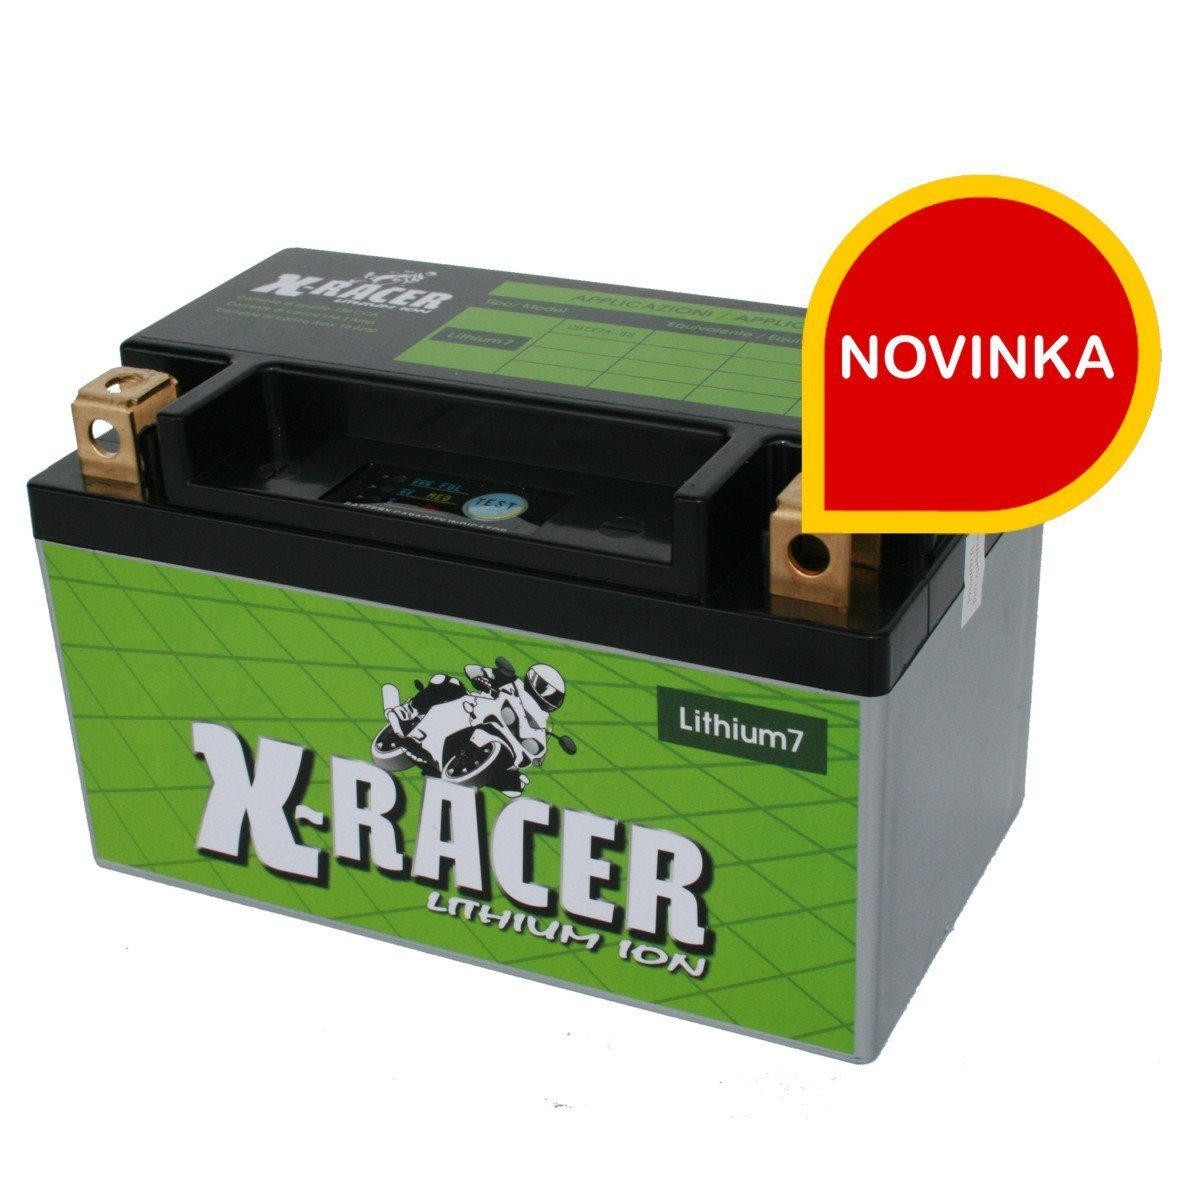 X-RACER Lithium7